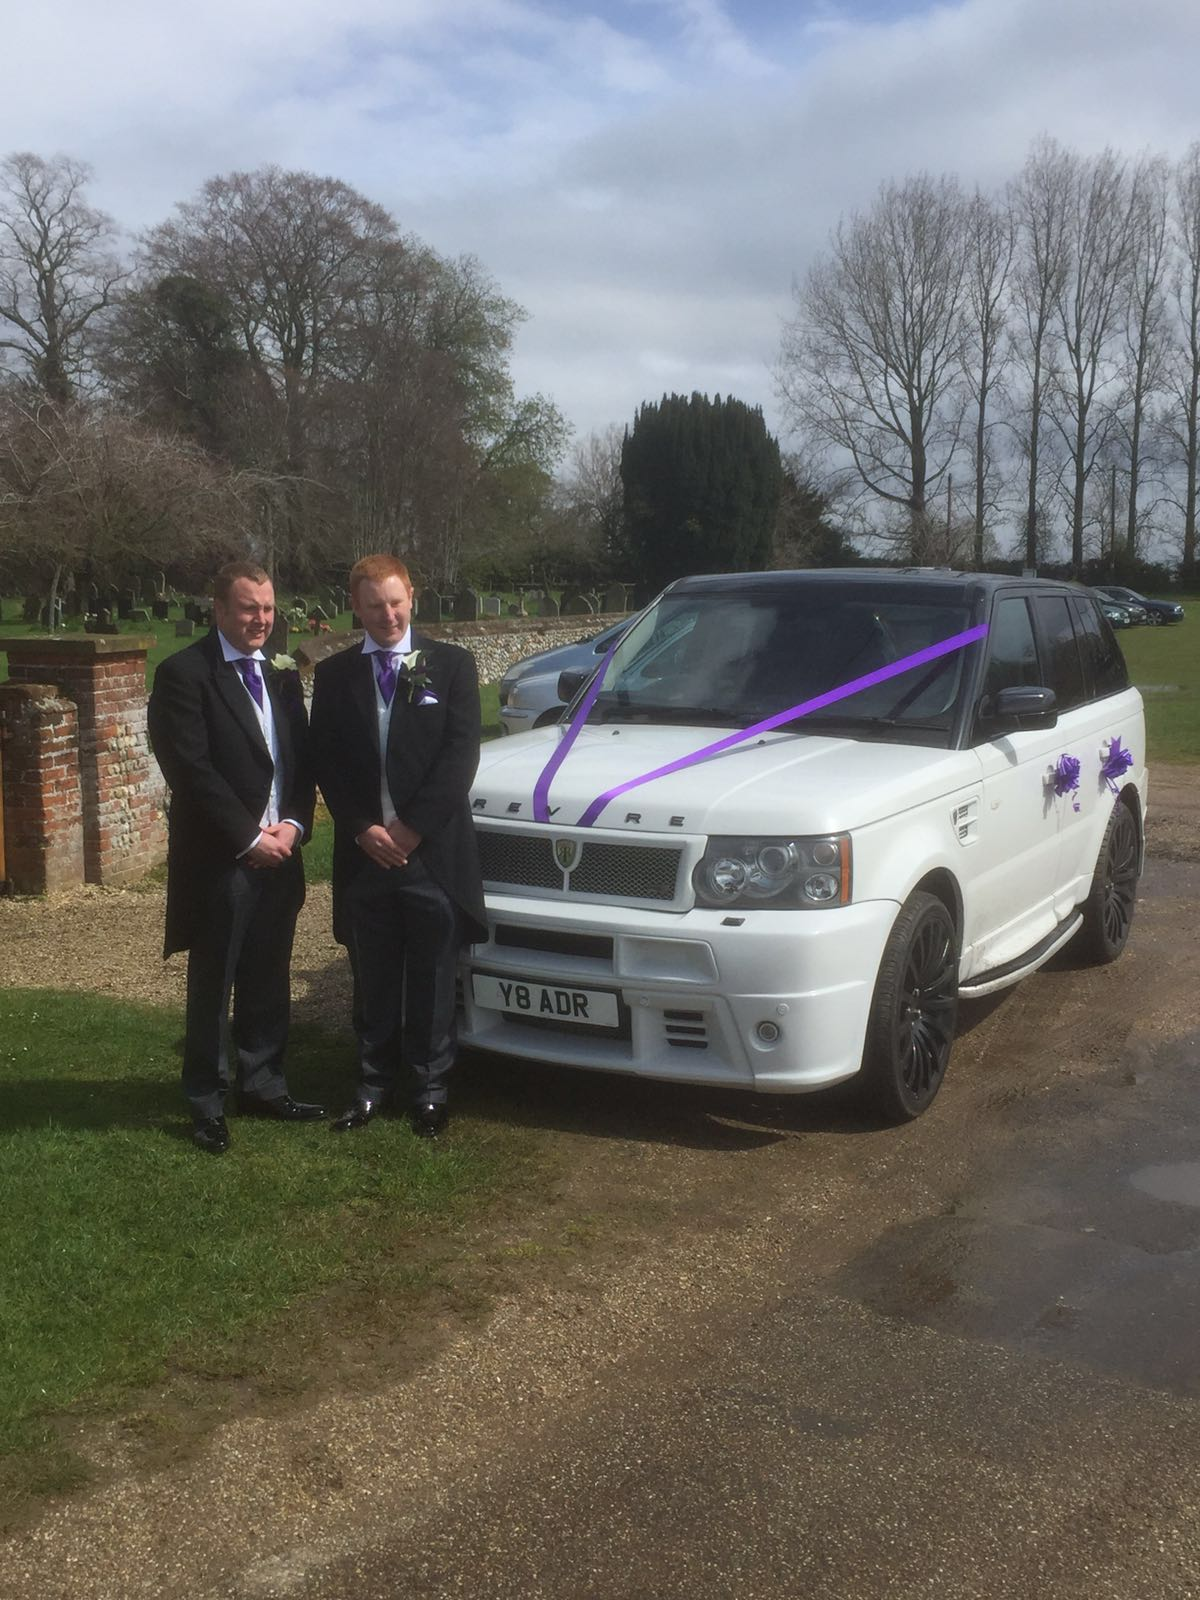 Range Rover Hire in Norwich